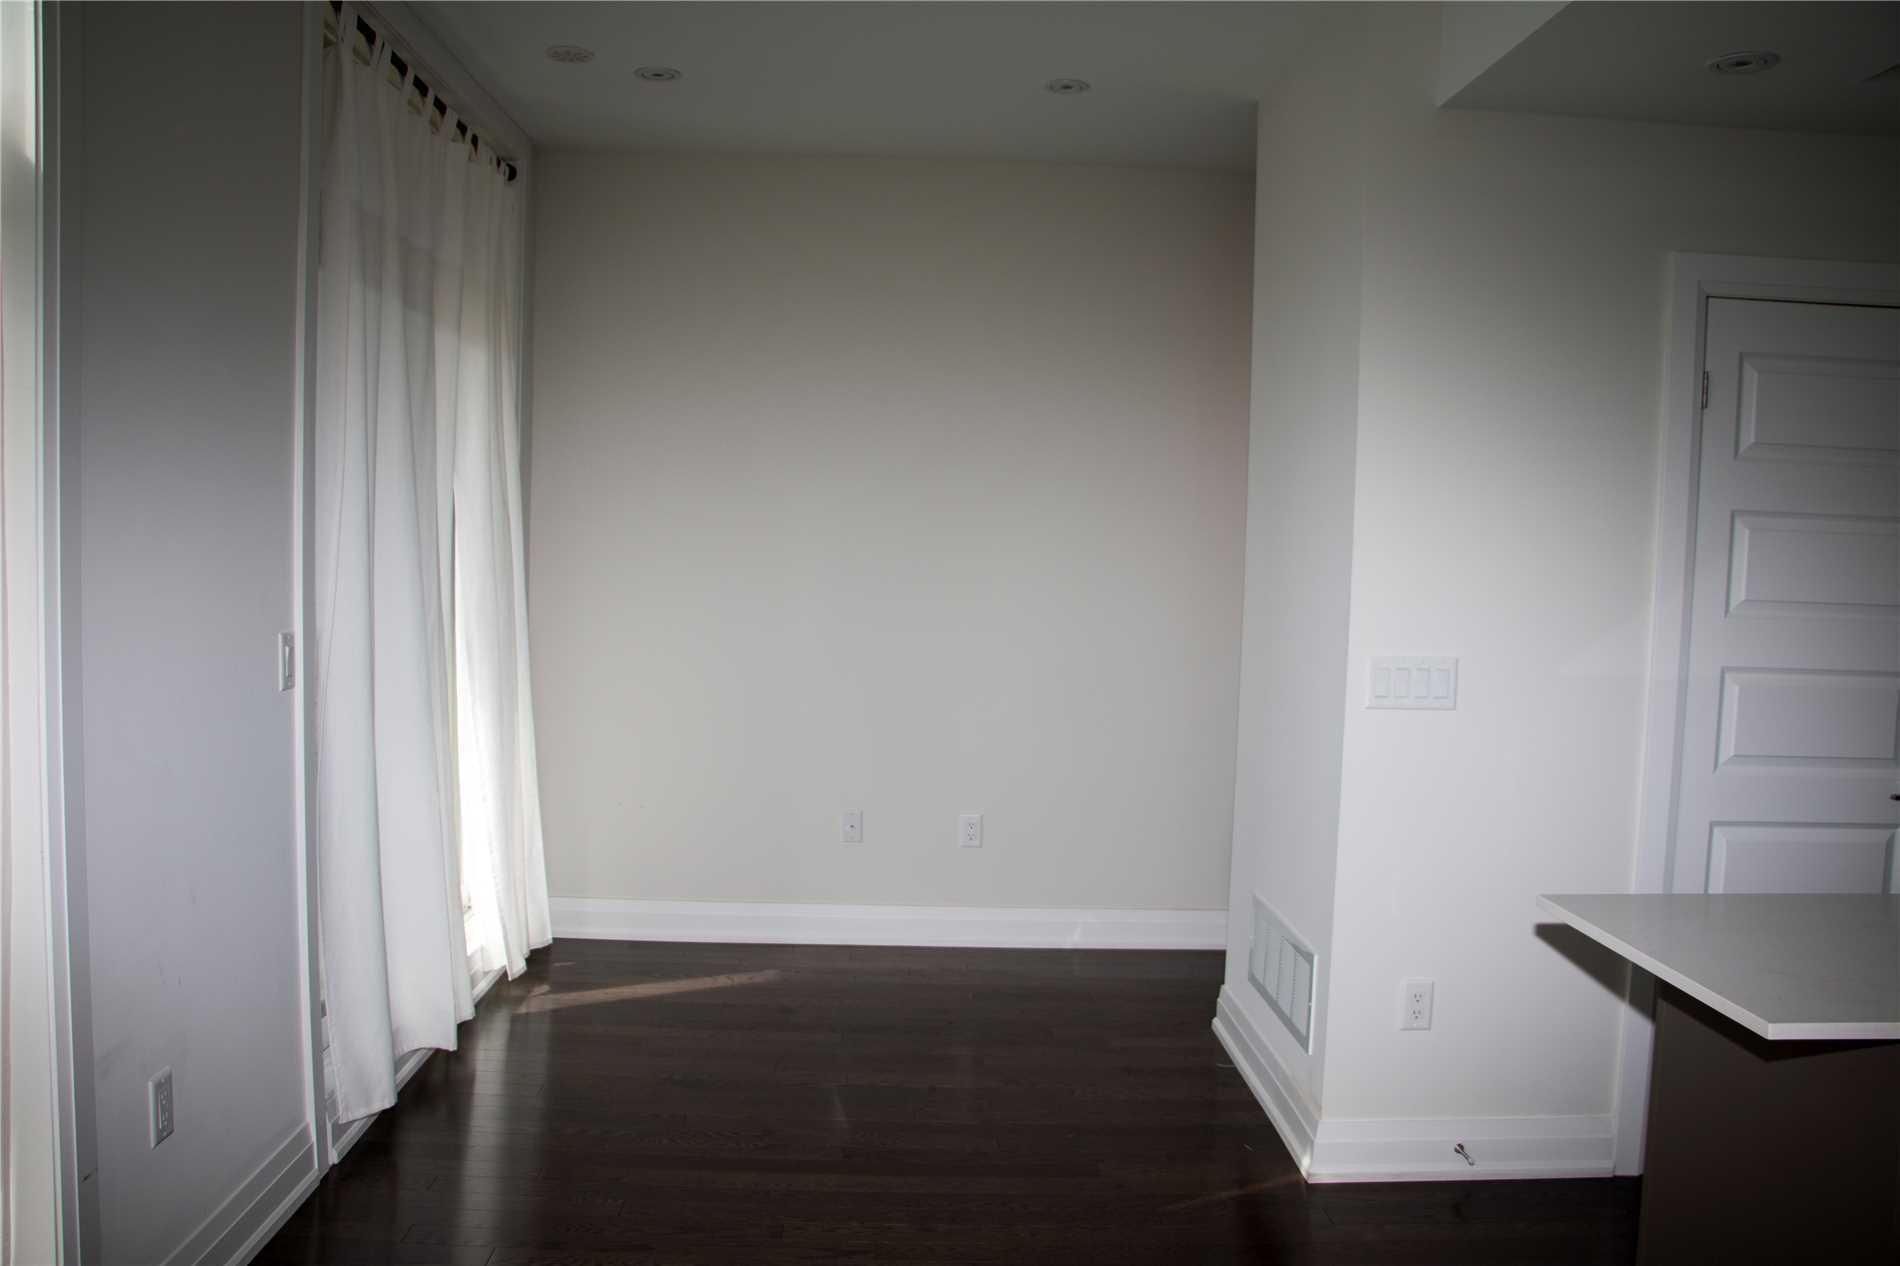 Condo Townhouse For Lease In Toronto , 2 Bedrooms Bedrooms, ,2 BathroomsBathrooms,Condo Townhouse,For Lease,22,Eldora